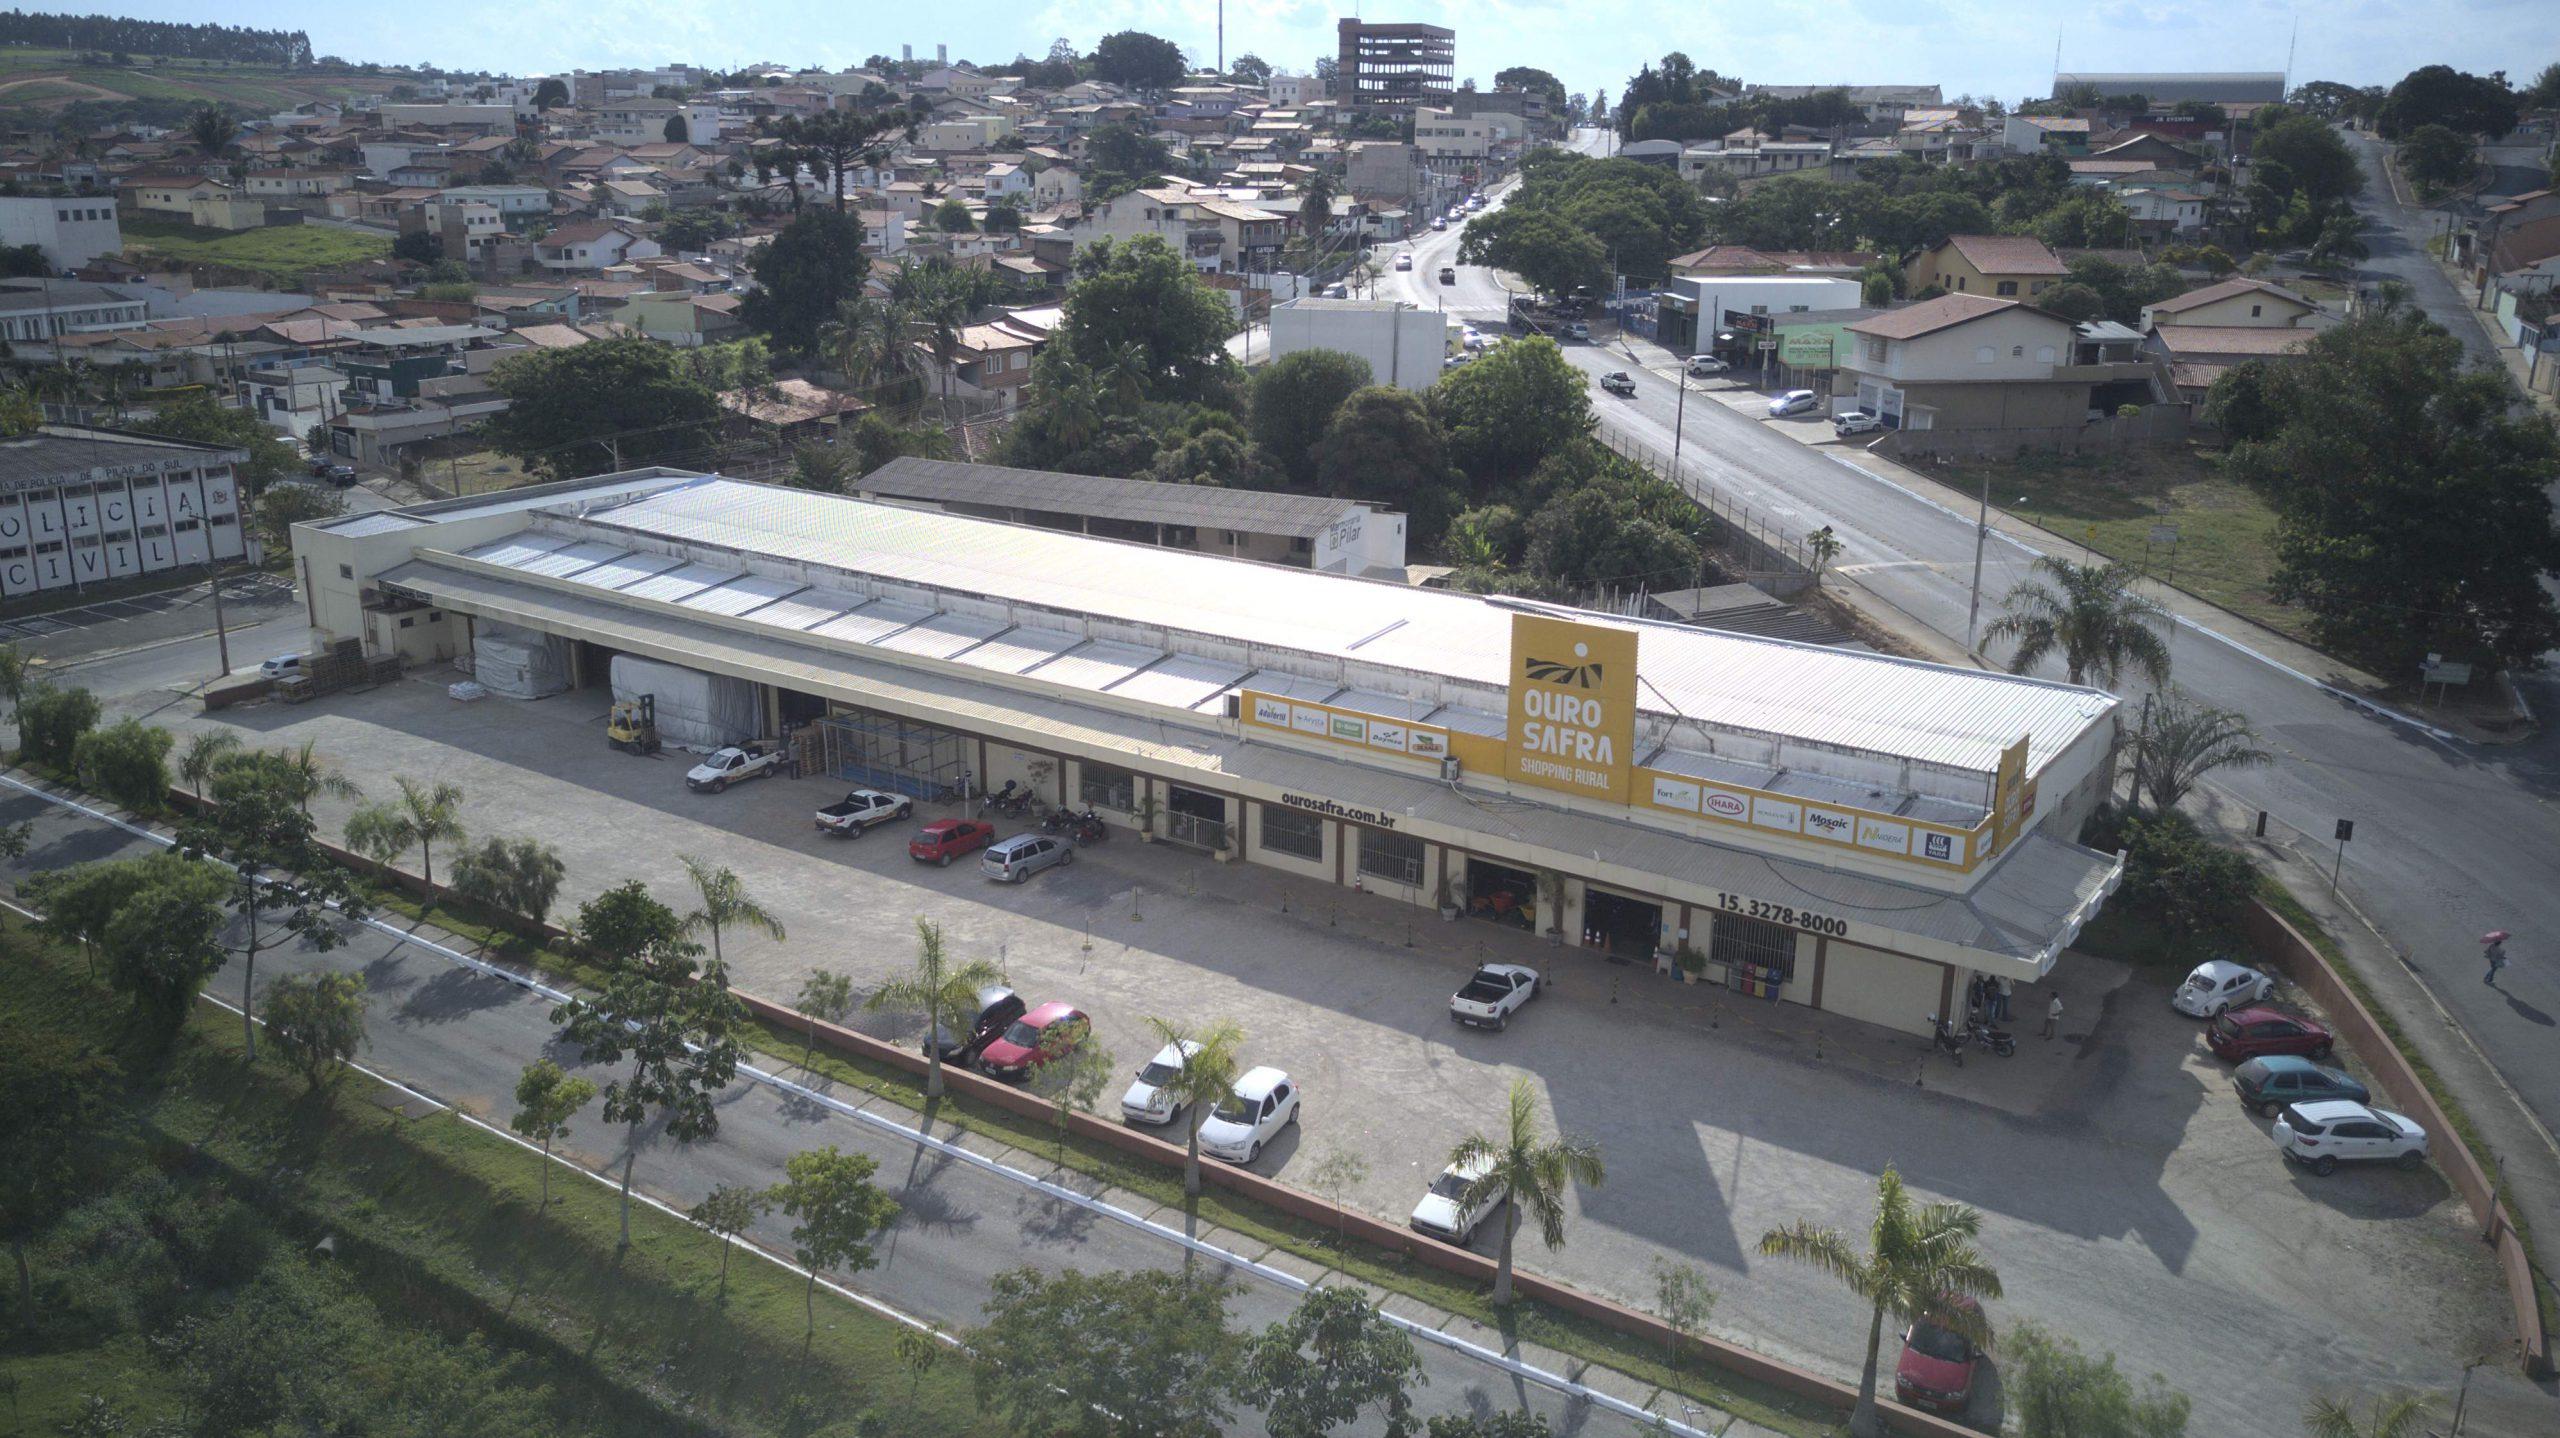 Pilar-loja-scaled.jpg